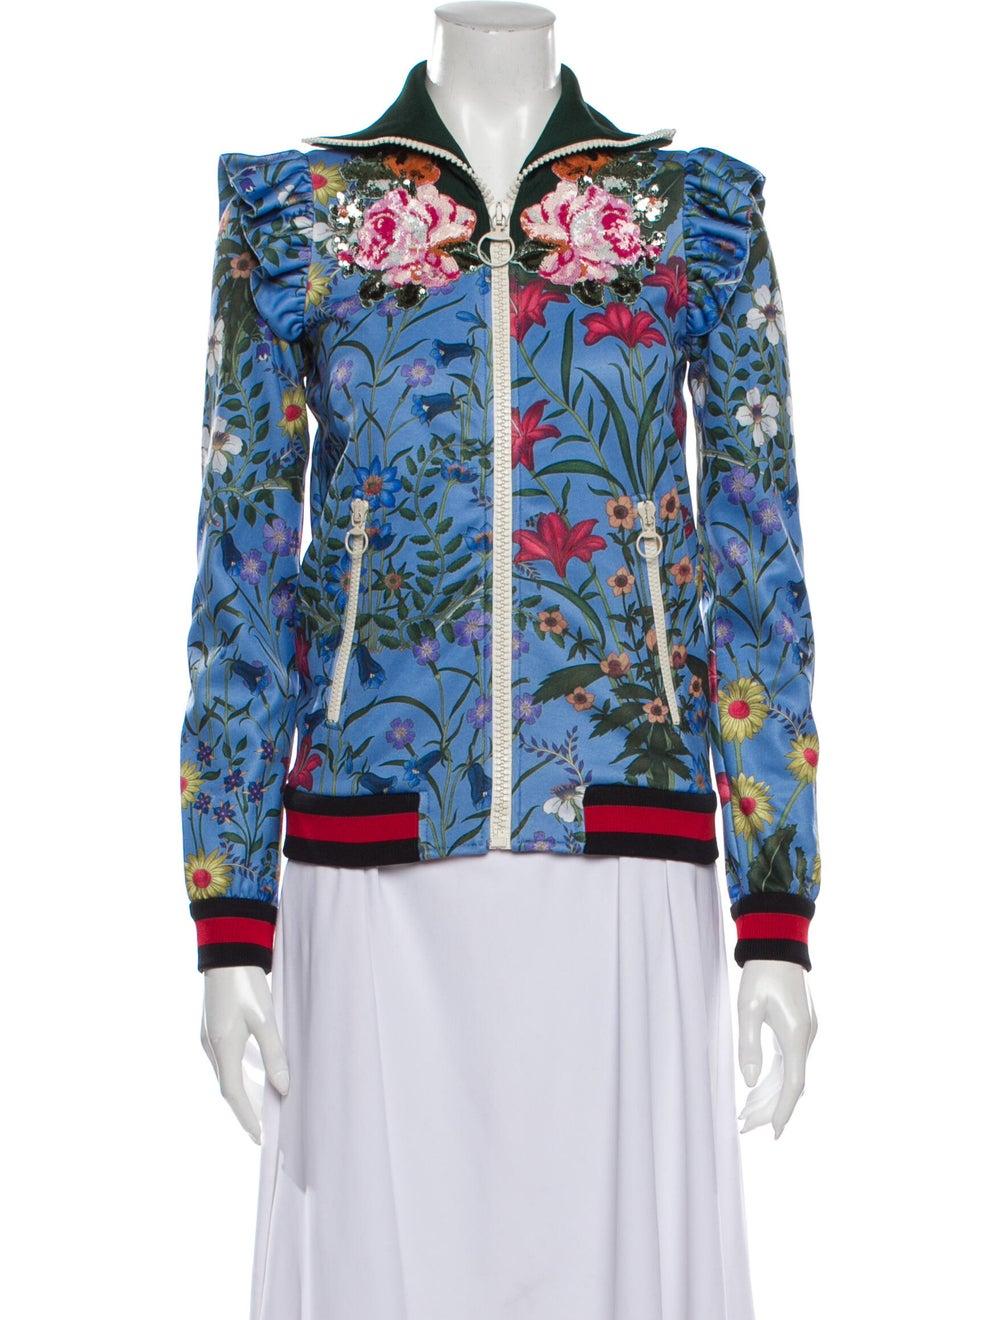 Gucci Floral Print Bomber Jacket Blue - image 1